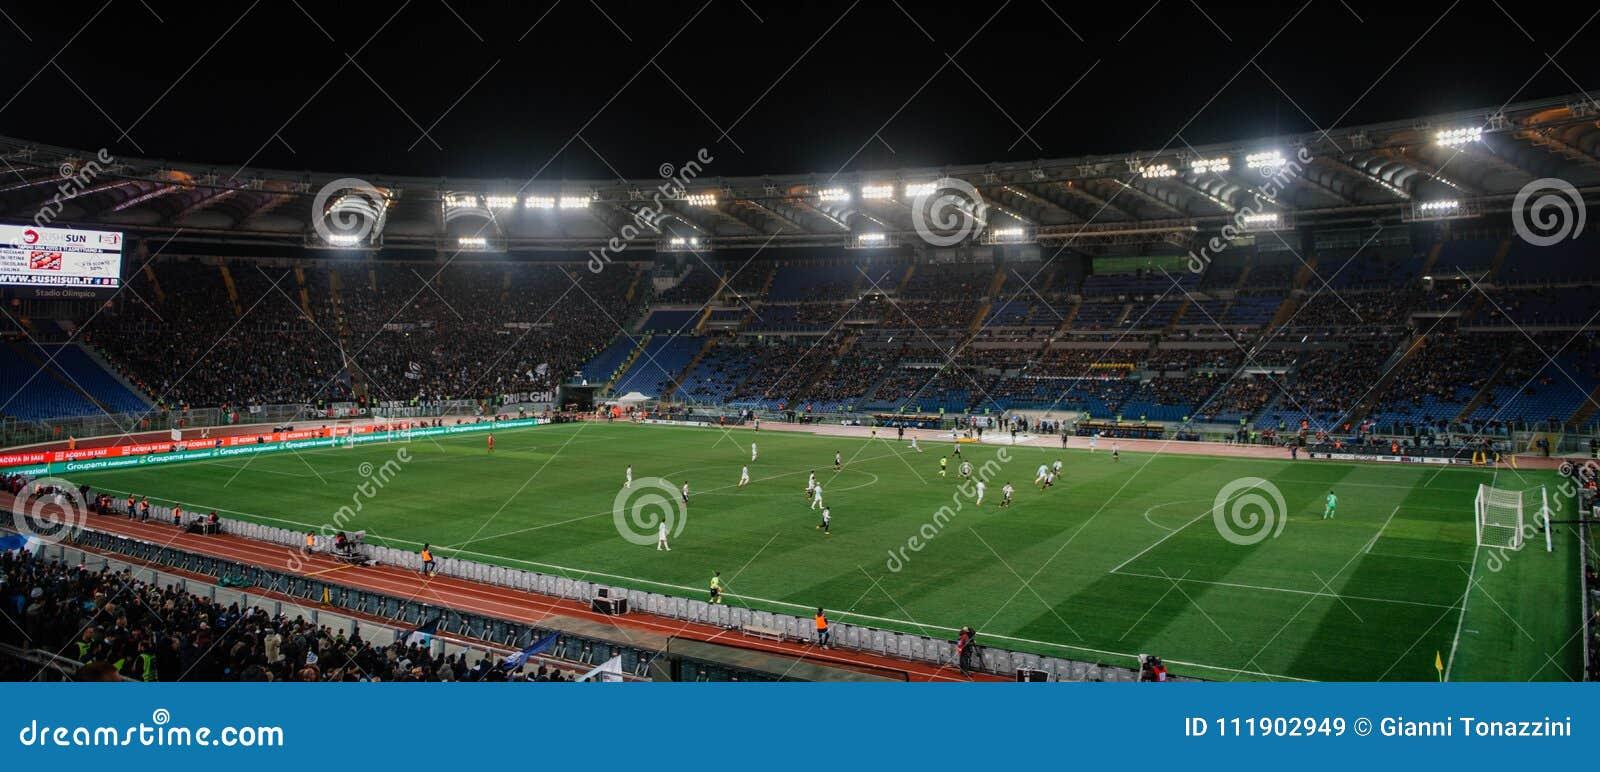 El estadio Olímpico en Roma, Italia